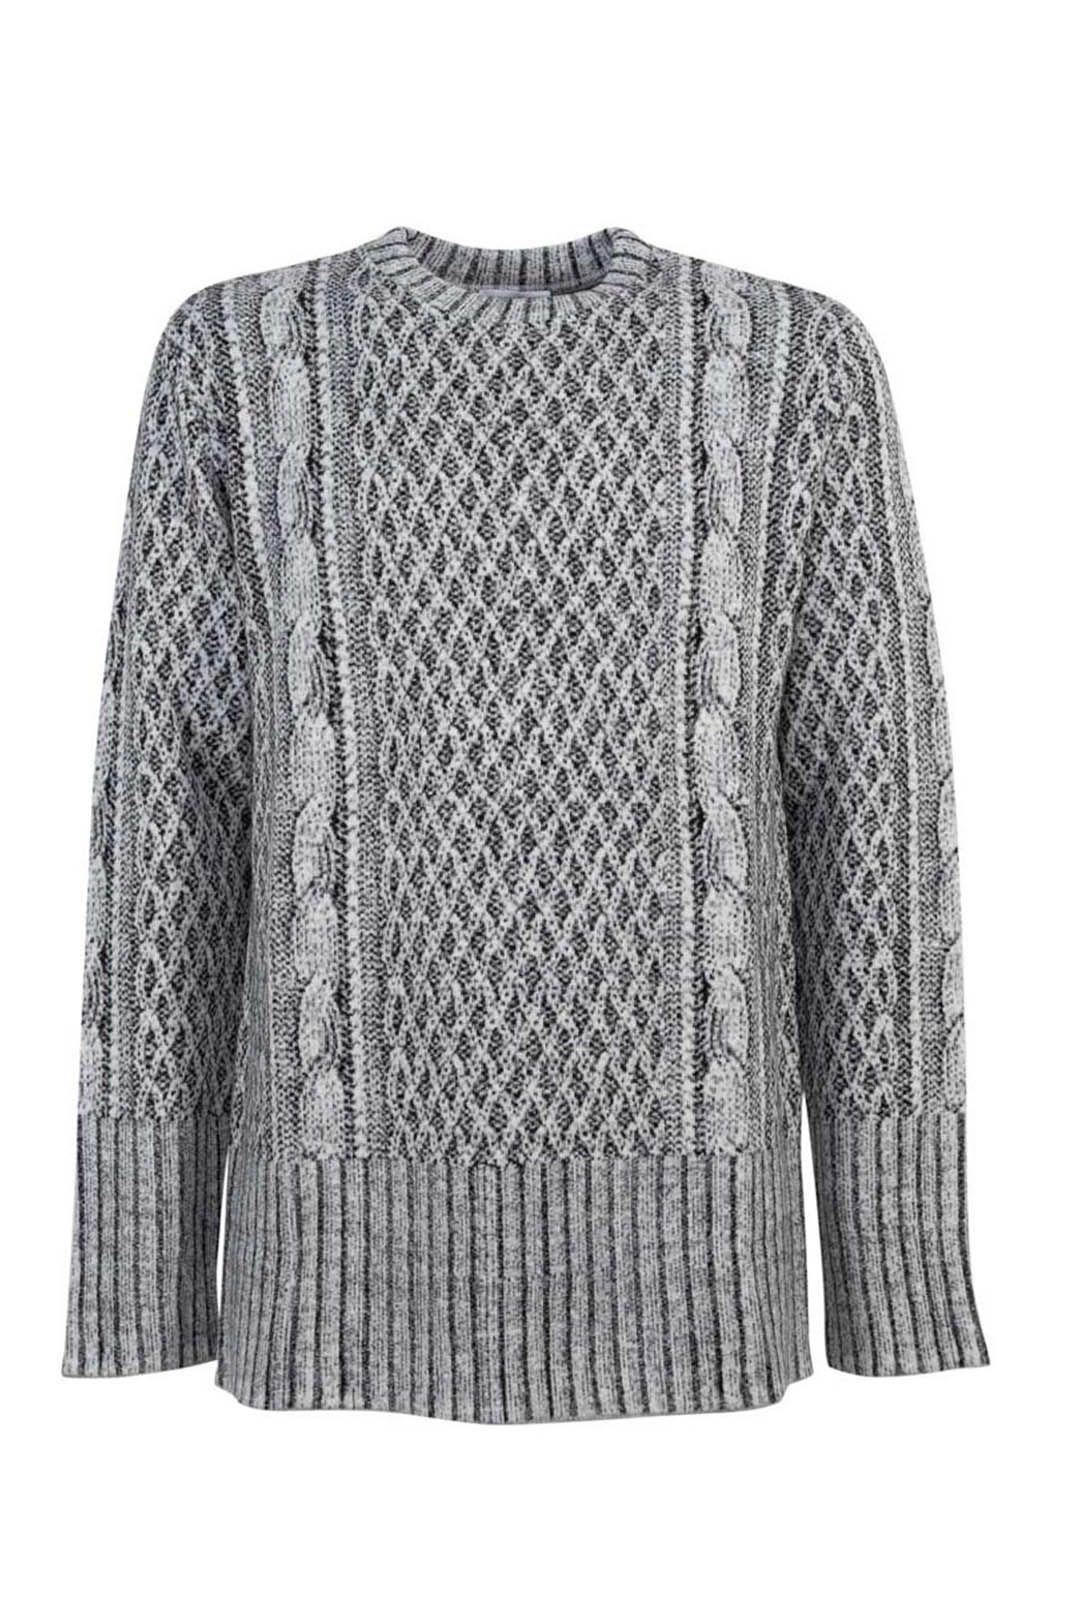 Ih Nom Uh Nit Grey Sweater